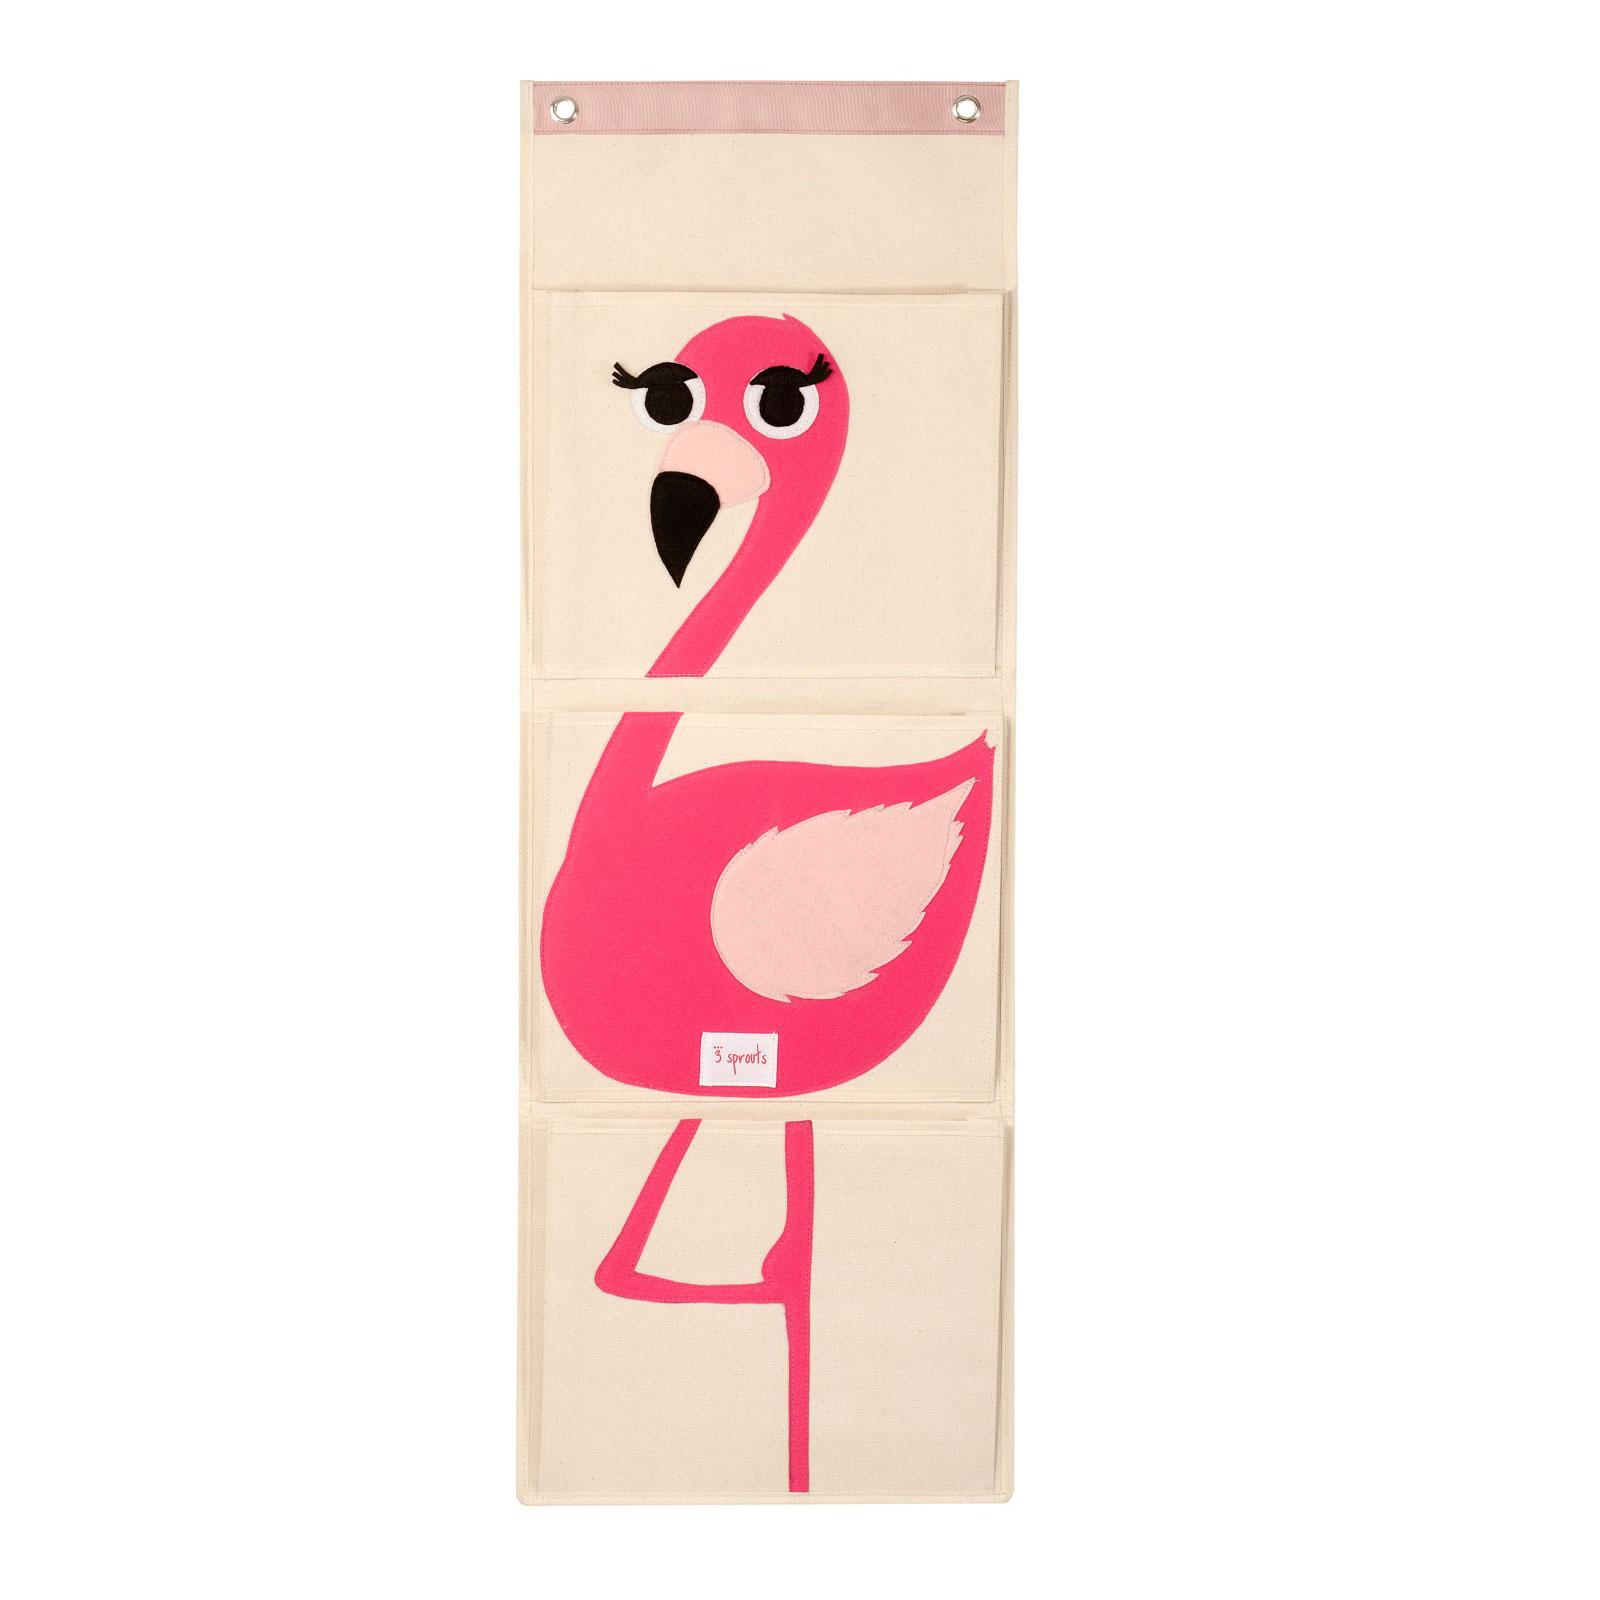 Органайзер на стену 3 Sprouts Фламинго (Pink Flamingo) Арт. 67411<br>